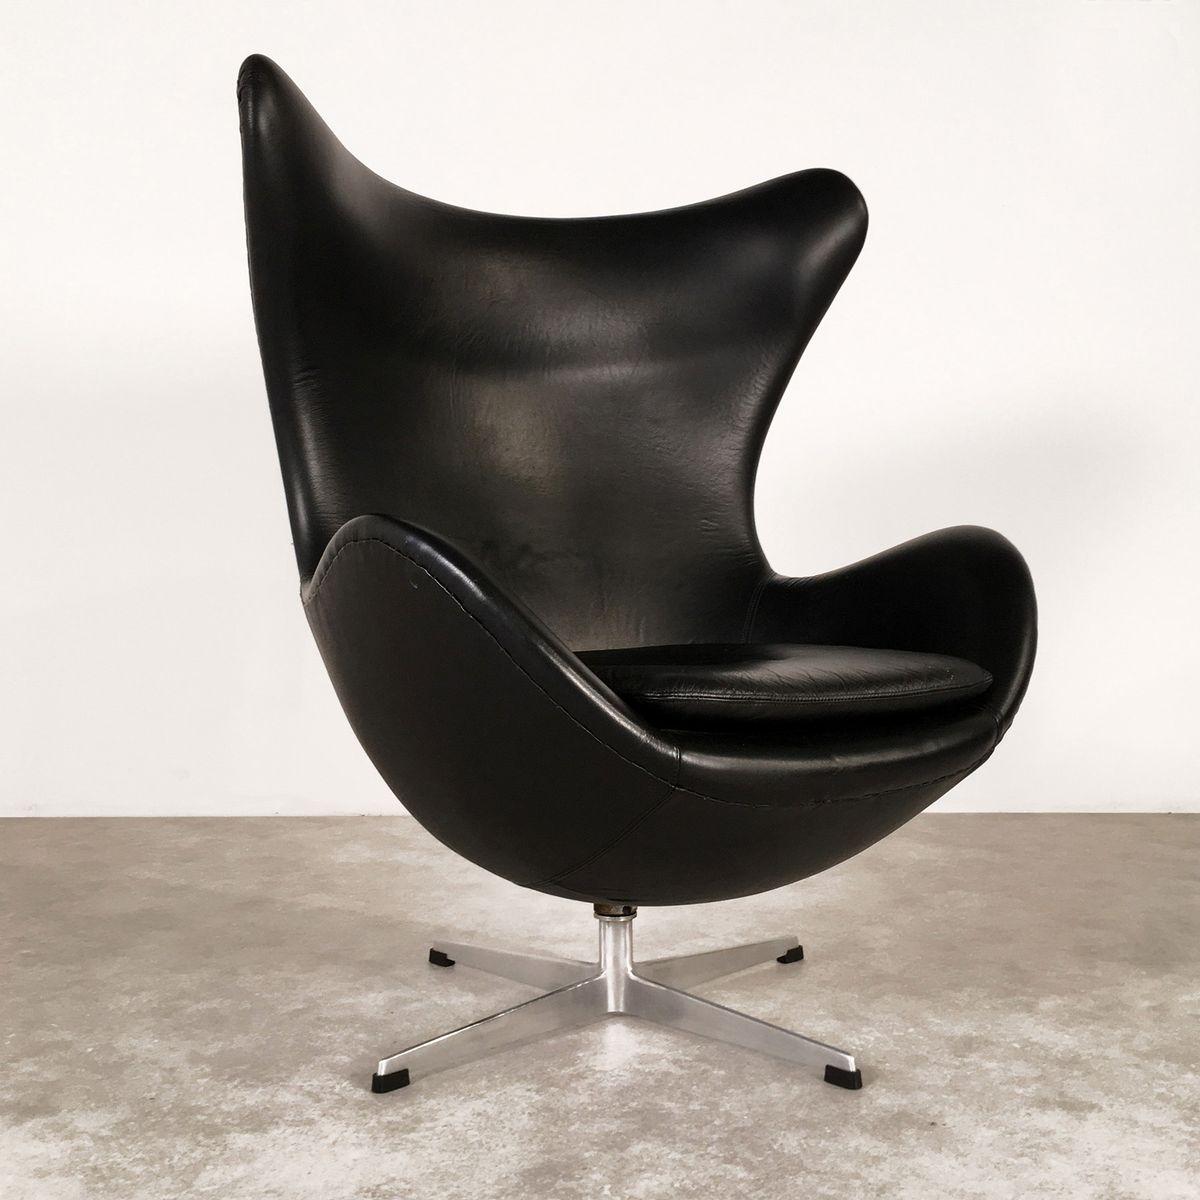 danish egg chair by arne jacobsen for fritz hansen 1963 for sale at pamono. Black Bedroom Furniture Sets. Home Design Ideas